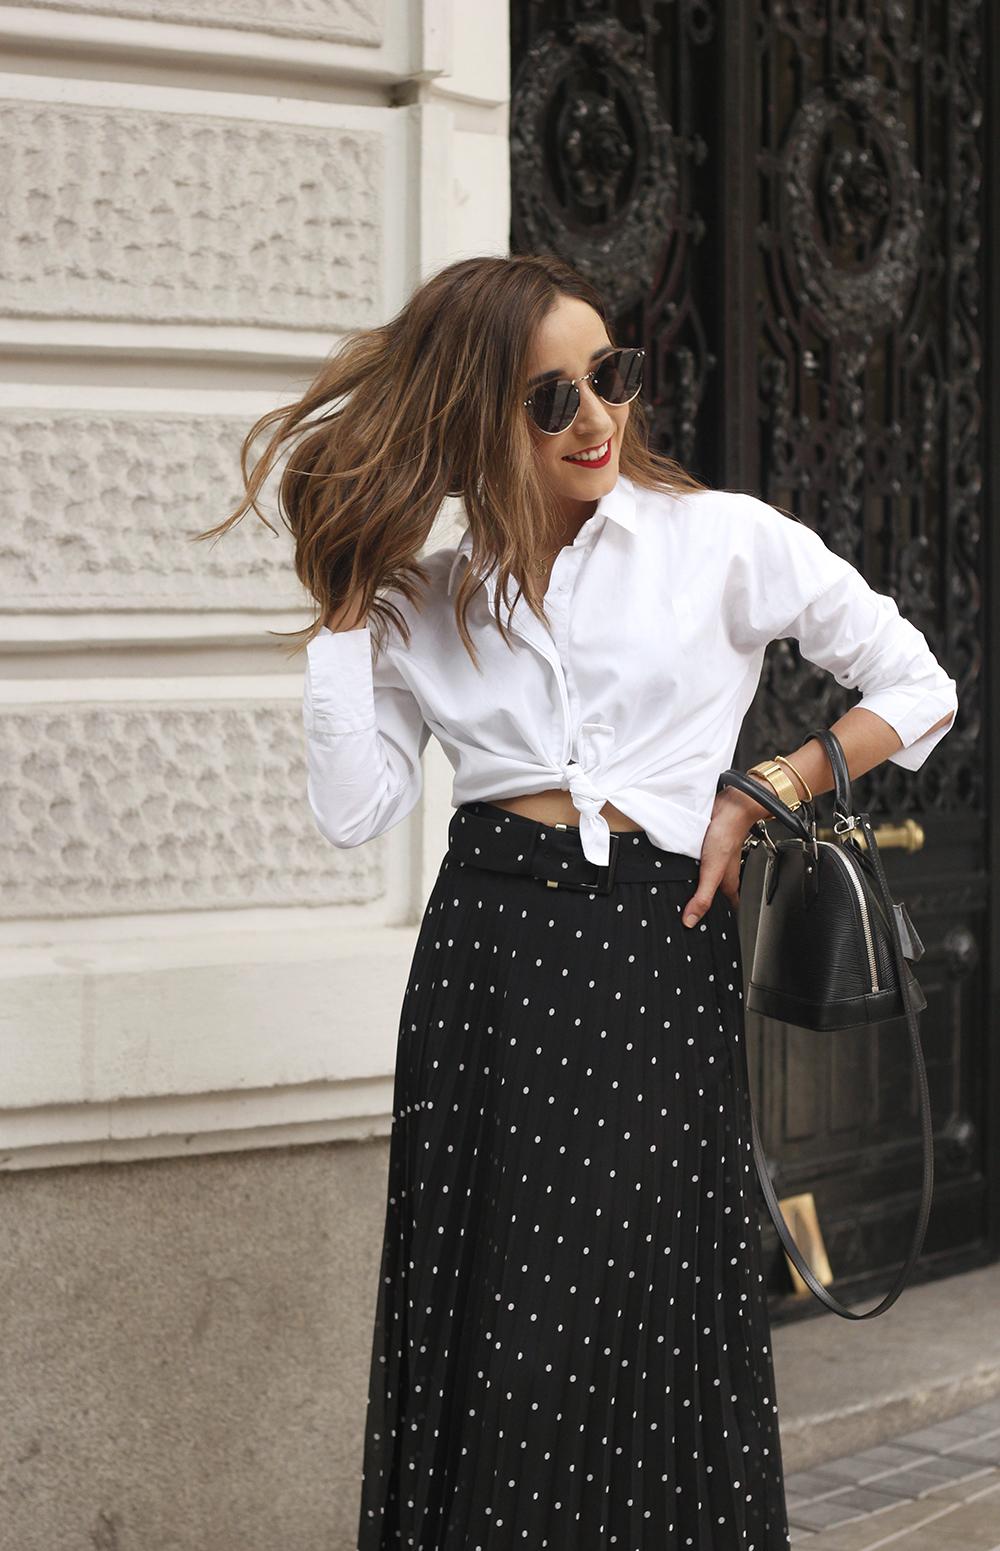 dots midi skirt white skirt louis vuitton black bag street style outfit 201911